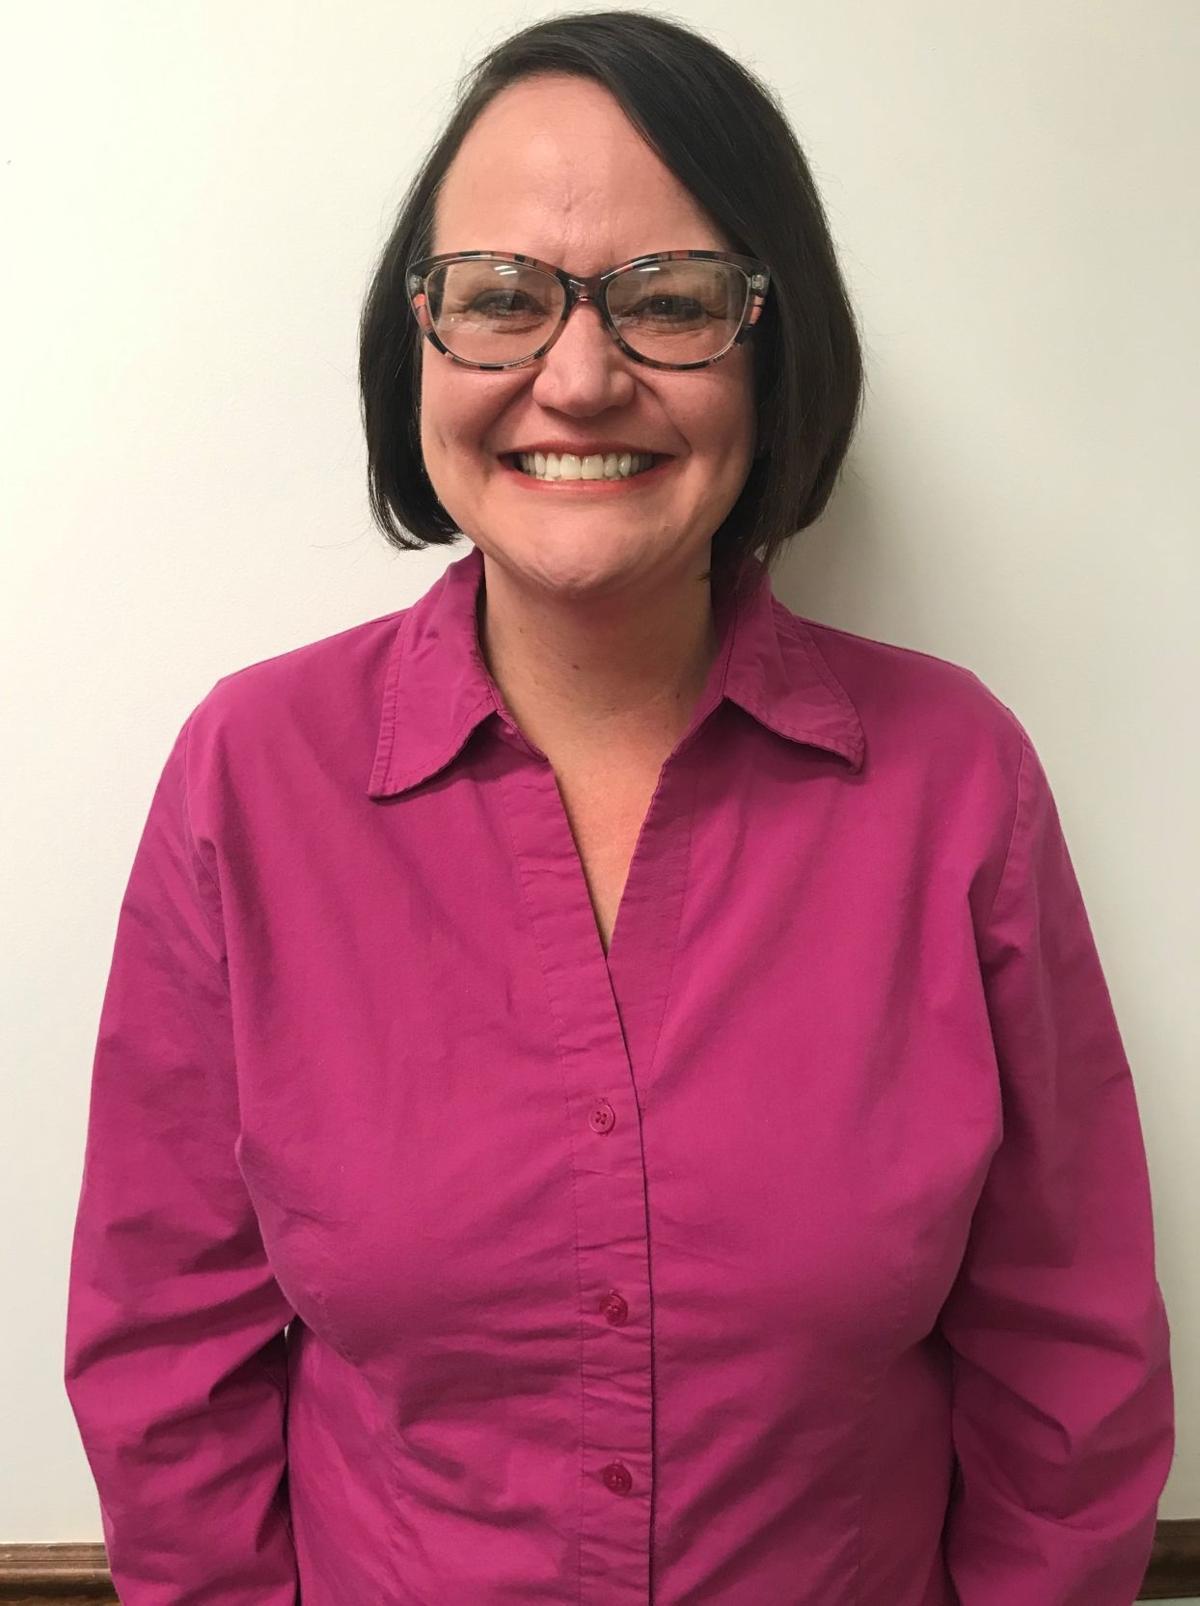 Christian County Public Health Administrator Denise Larson